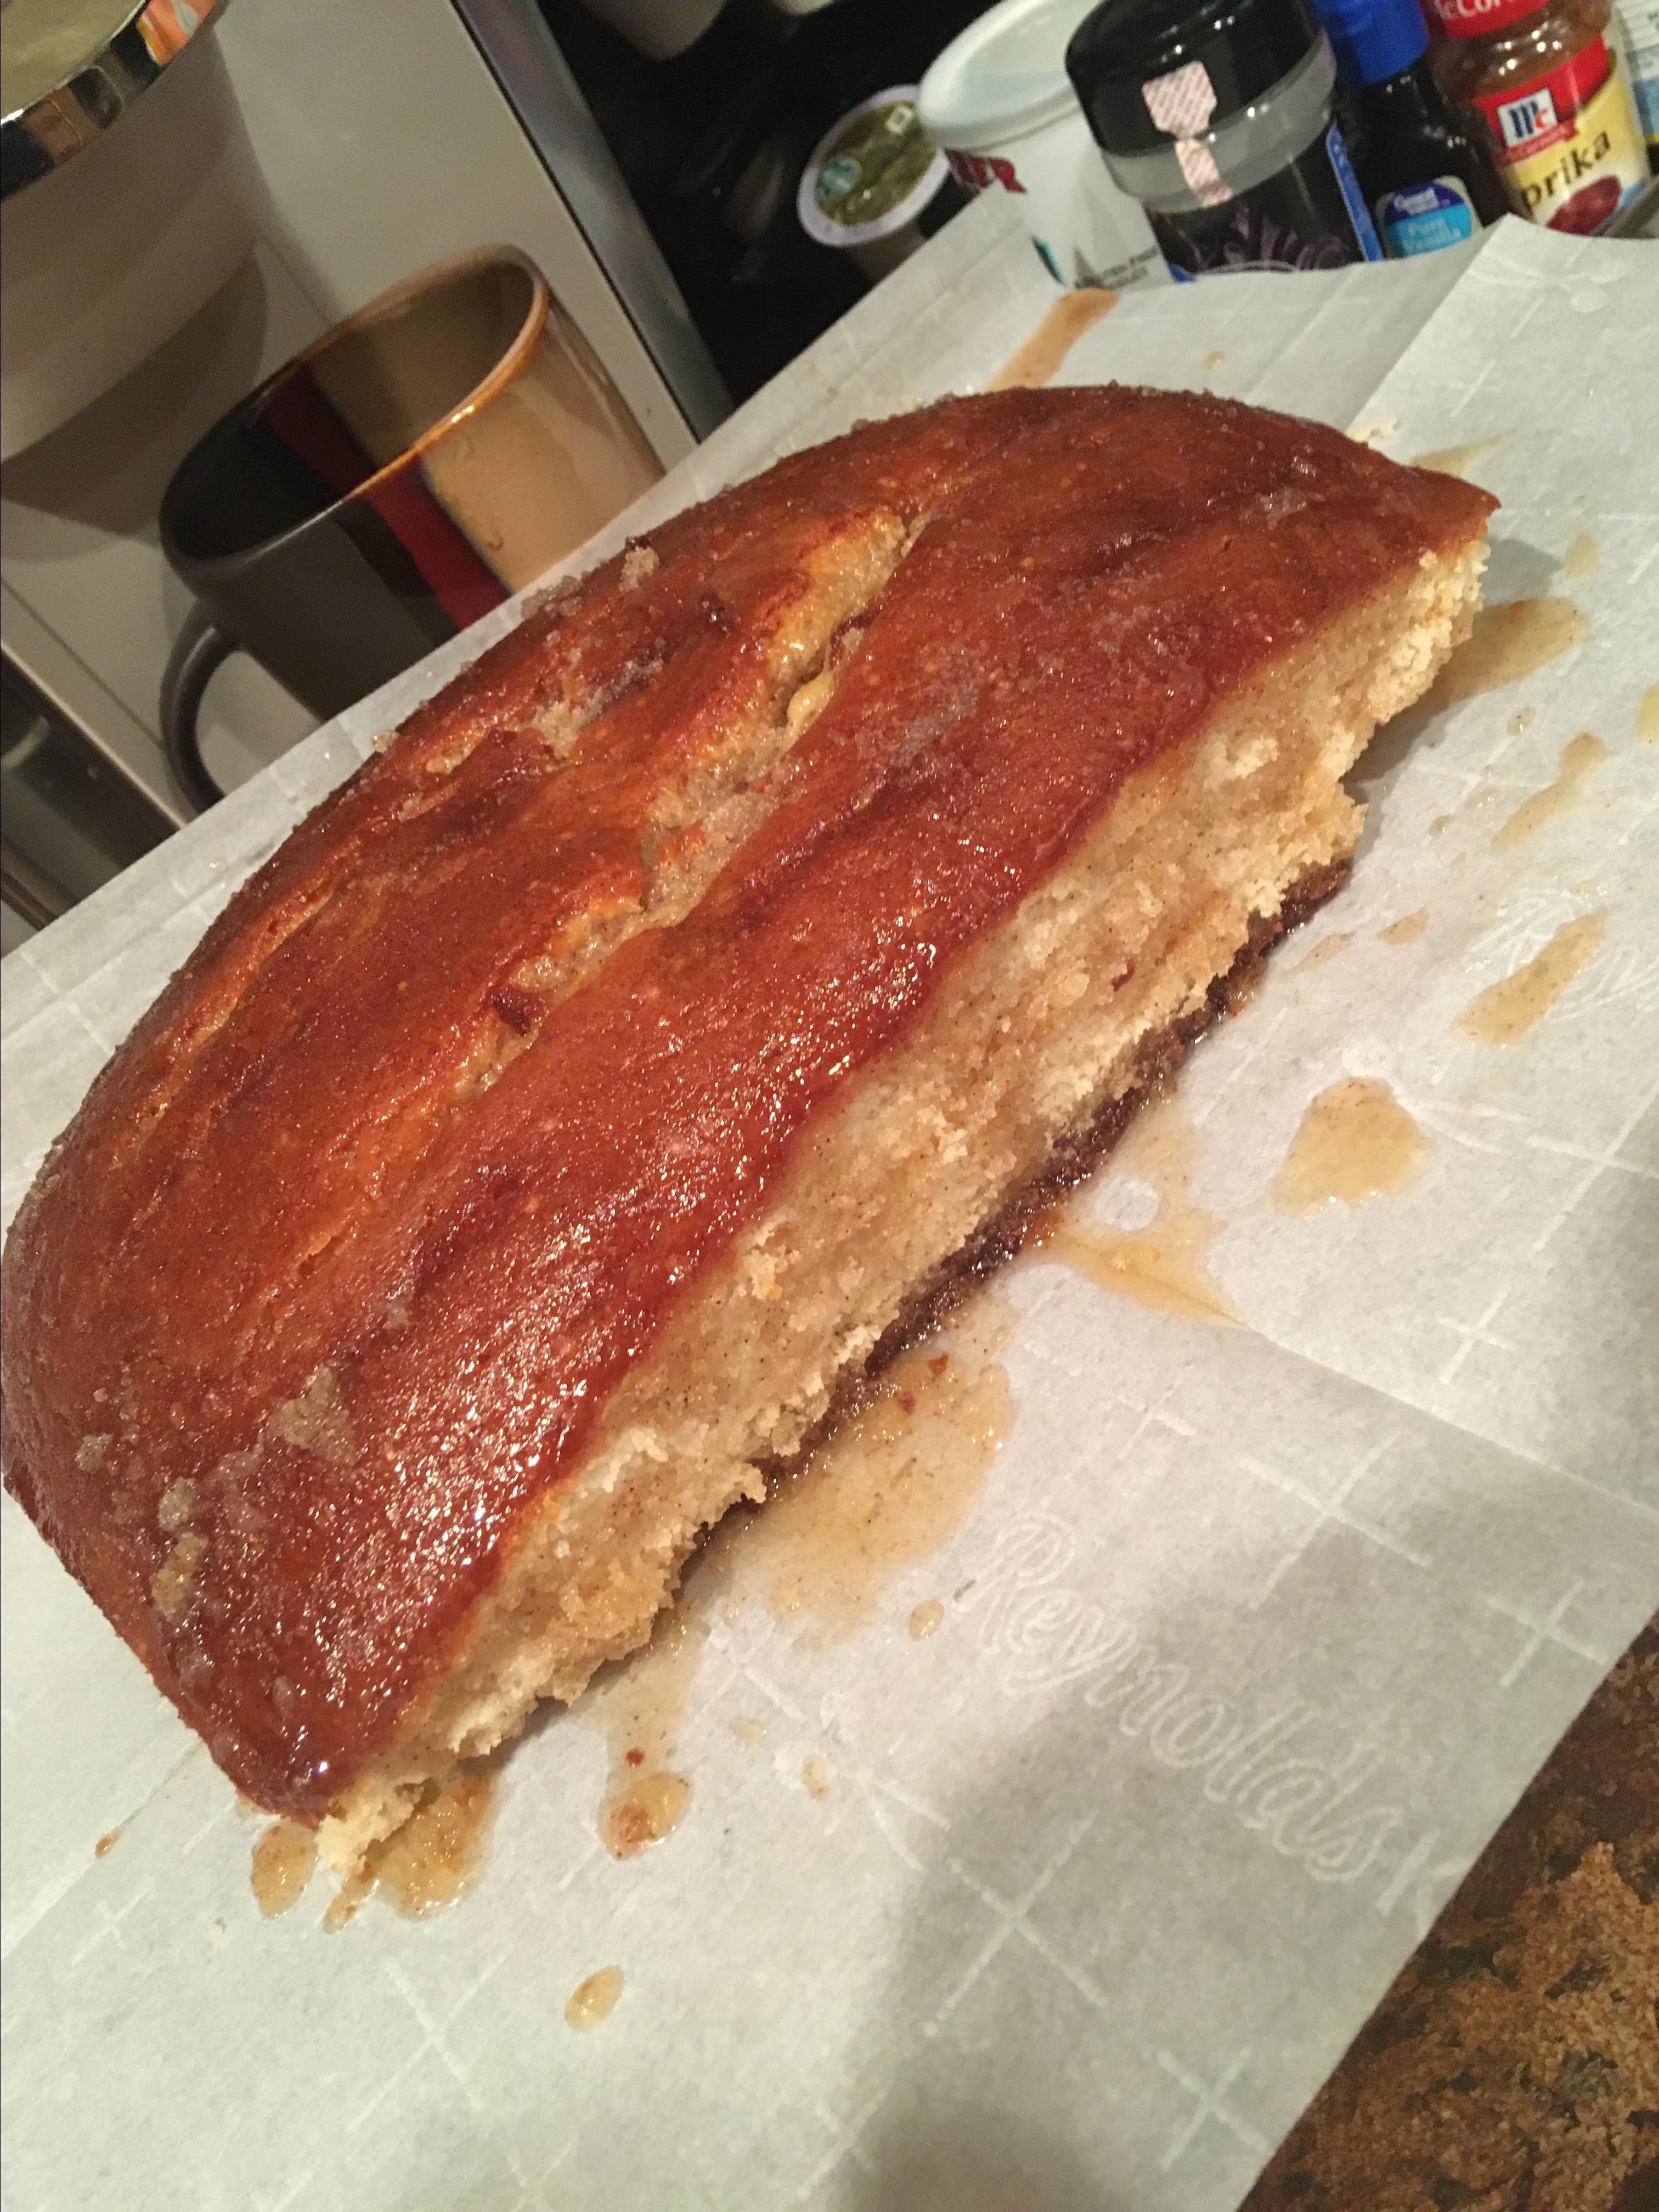 Buttery Cinnamon Cake